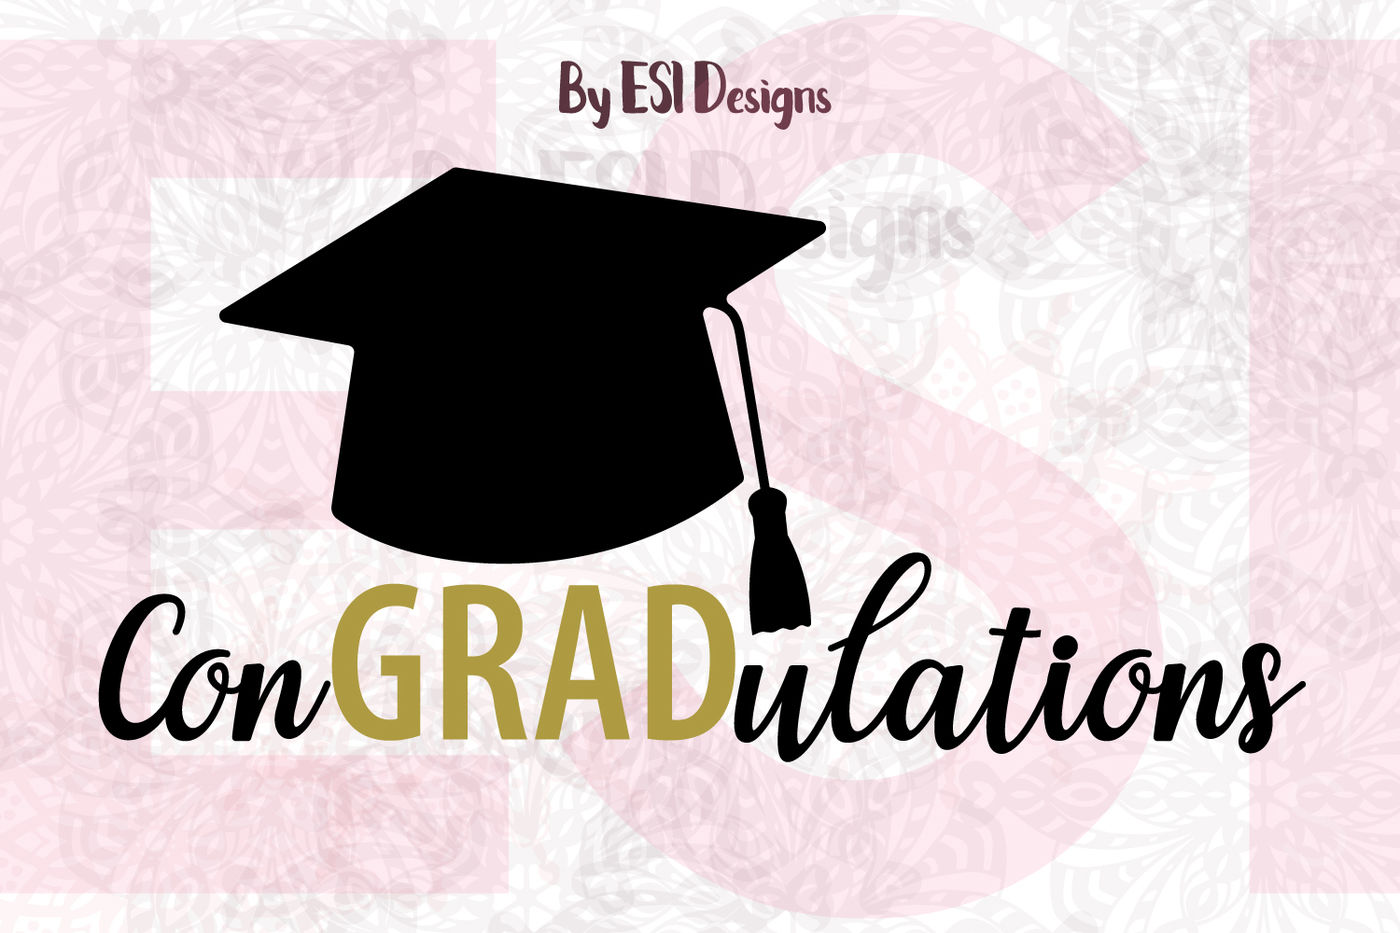 Congradulations Graduation Quote And Cap Design Svg Dxf Eps